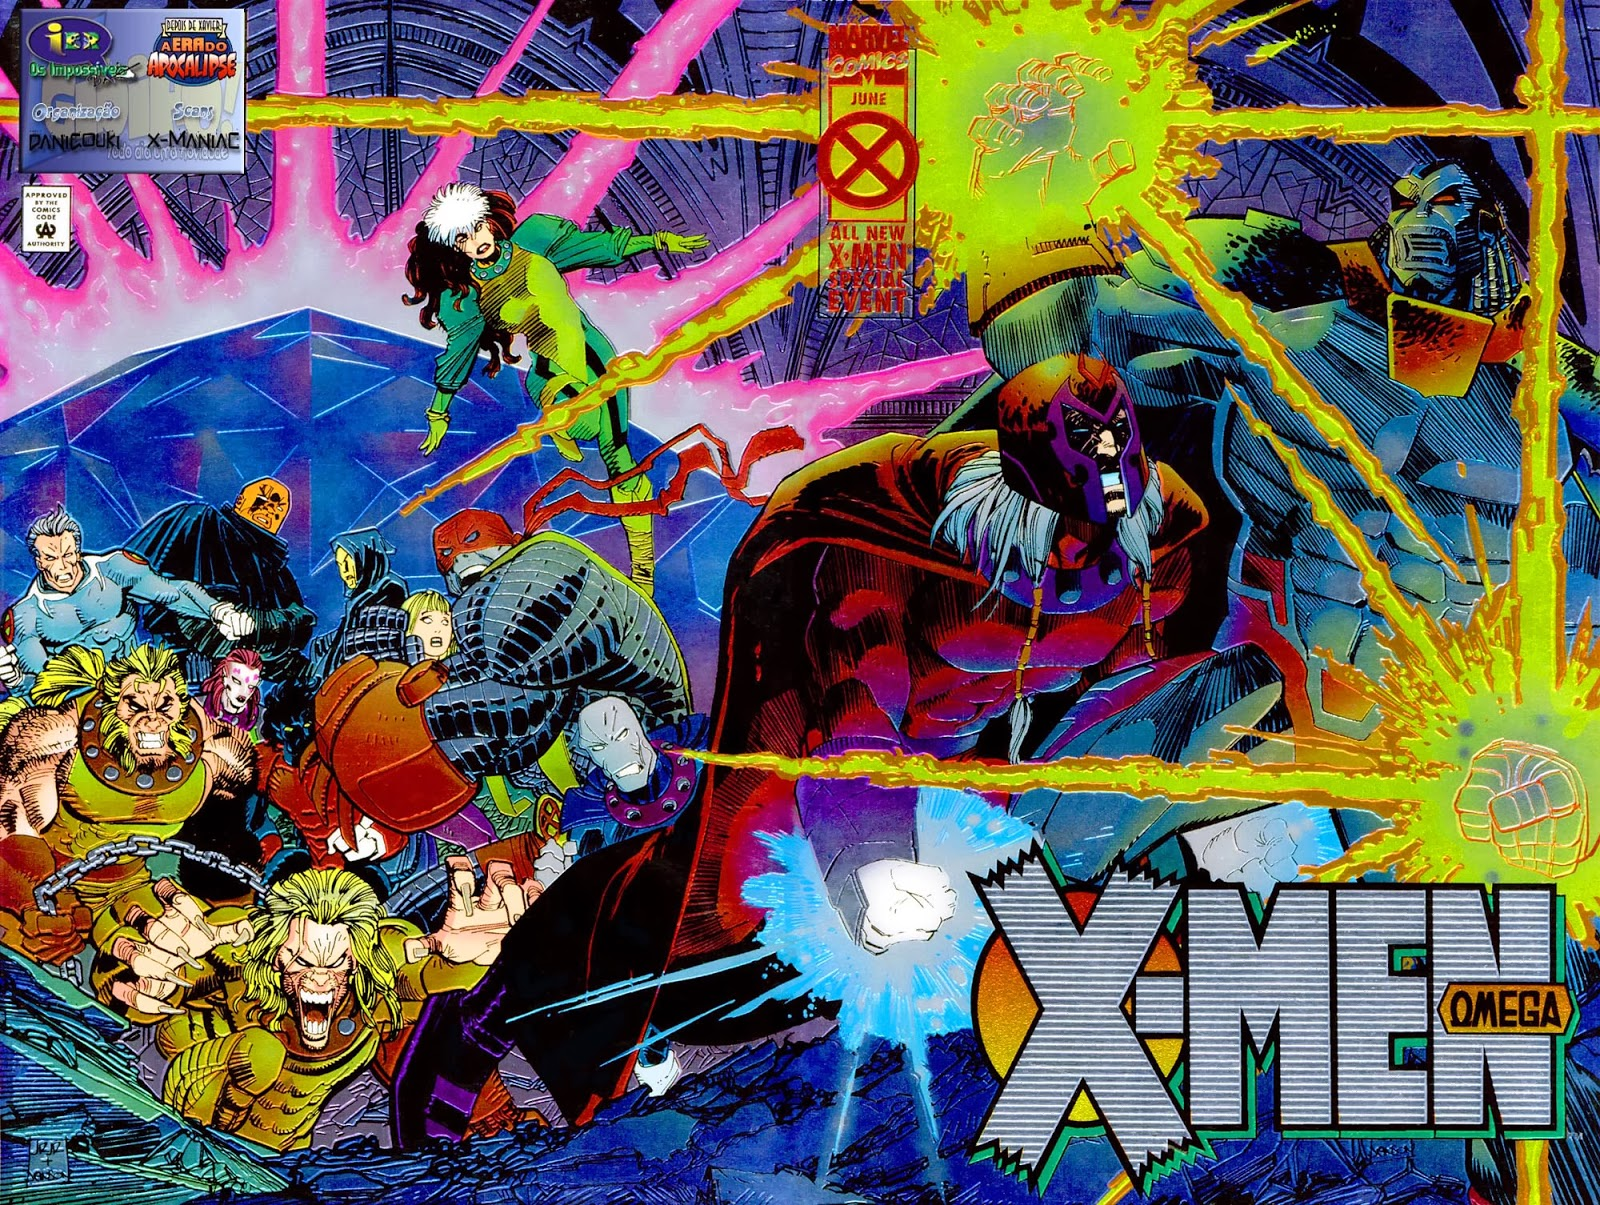 X-Men - A Era do Apocalipse #46